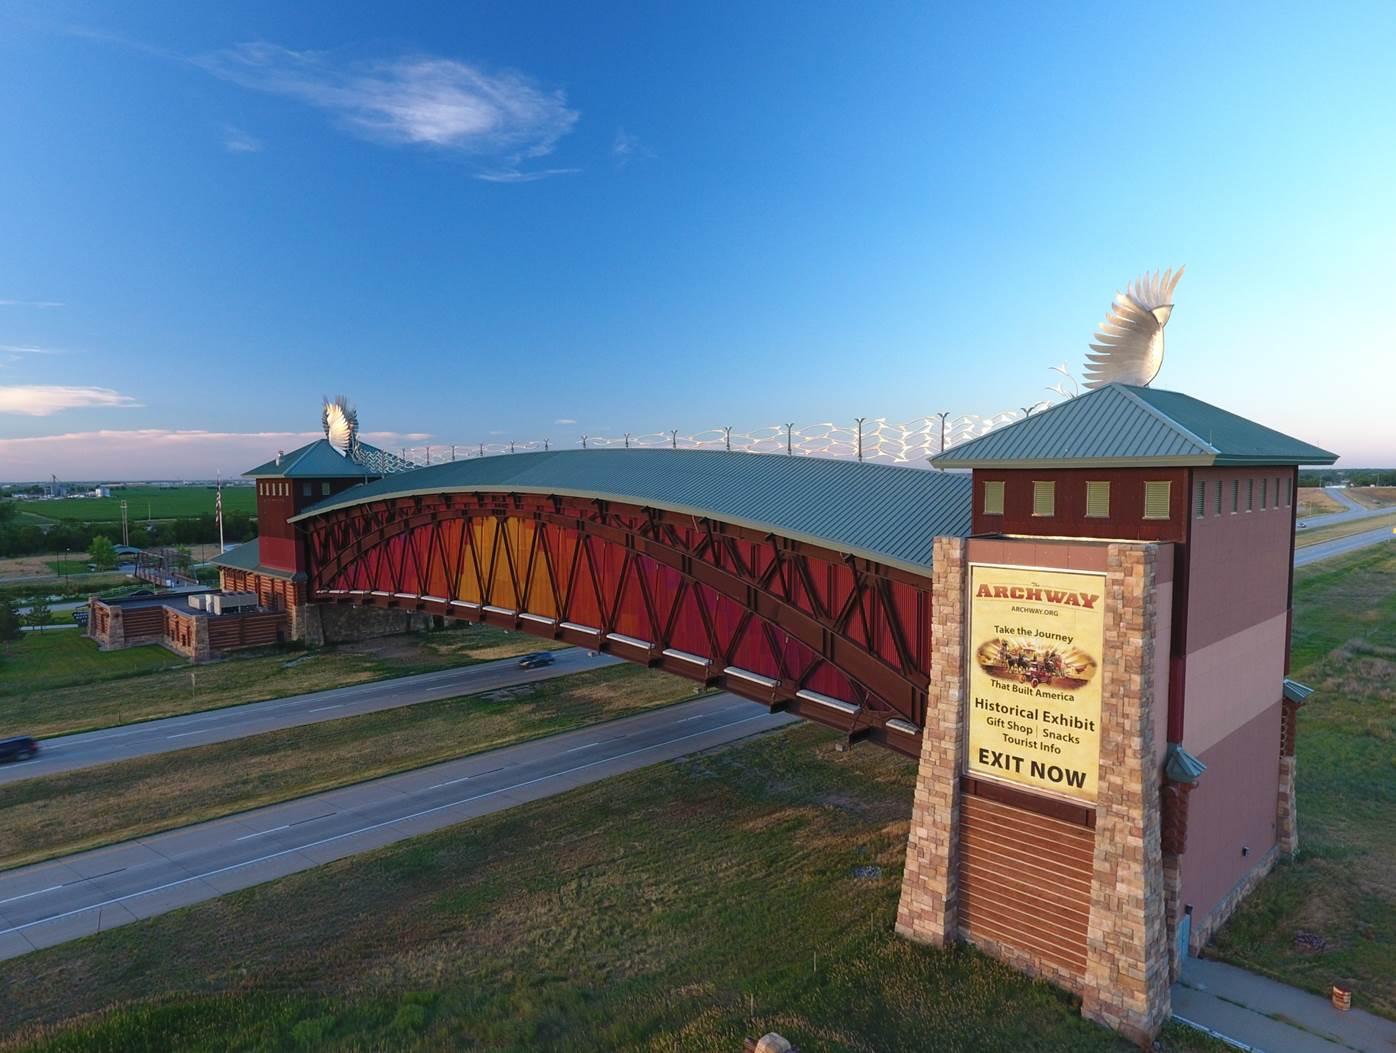 The Archway | VisitNebraska.com